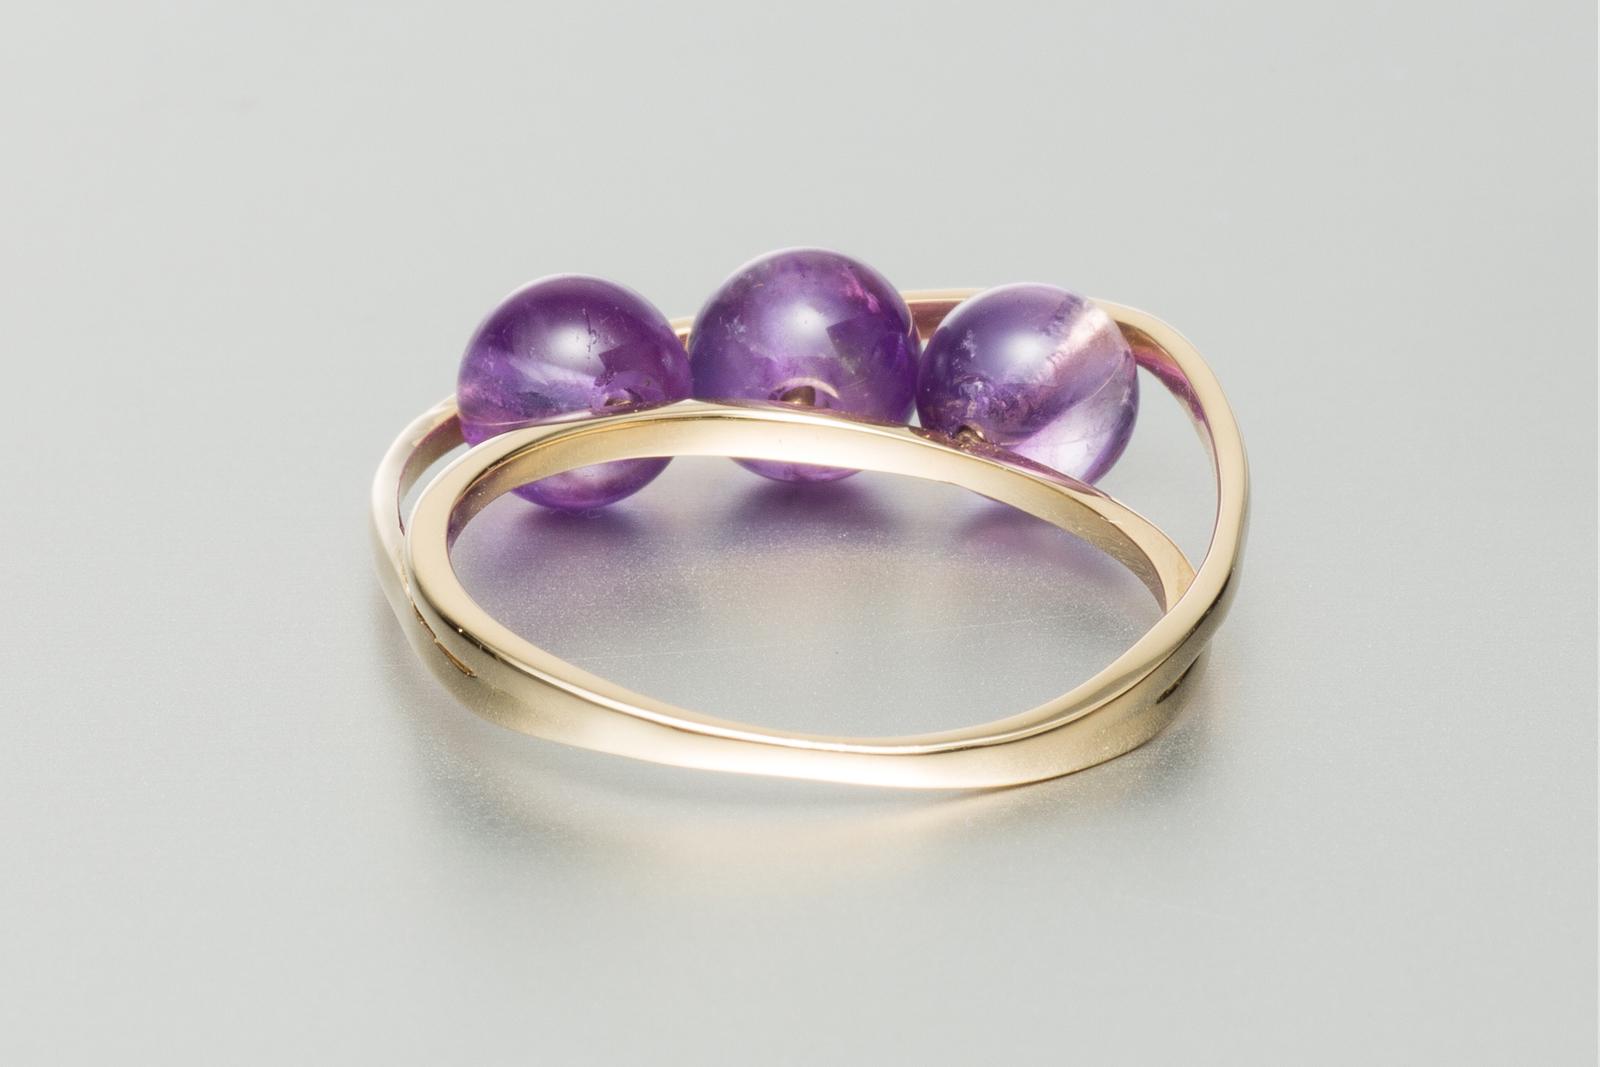 amethyst engagement ring alternative engagement ring